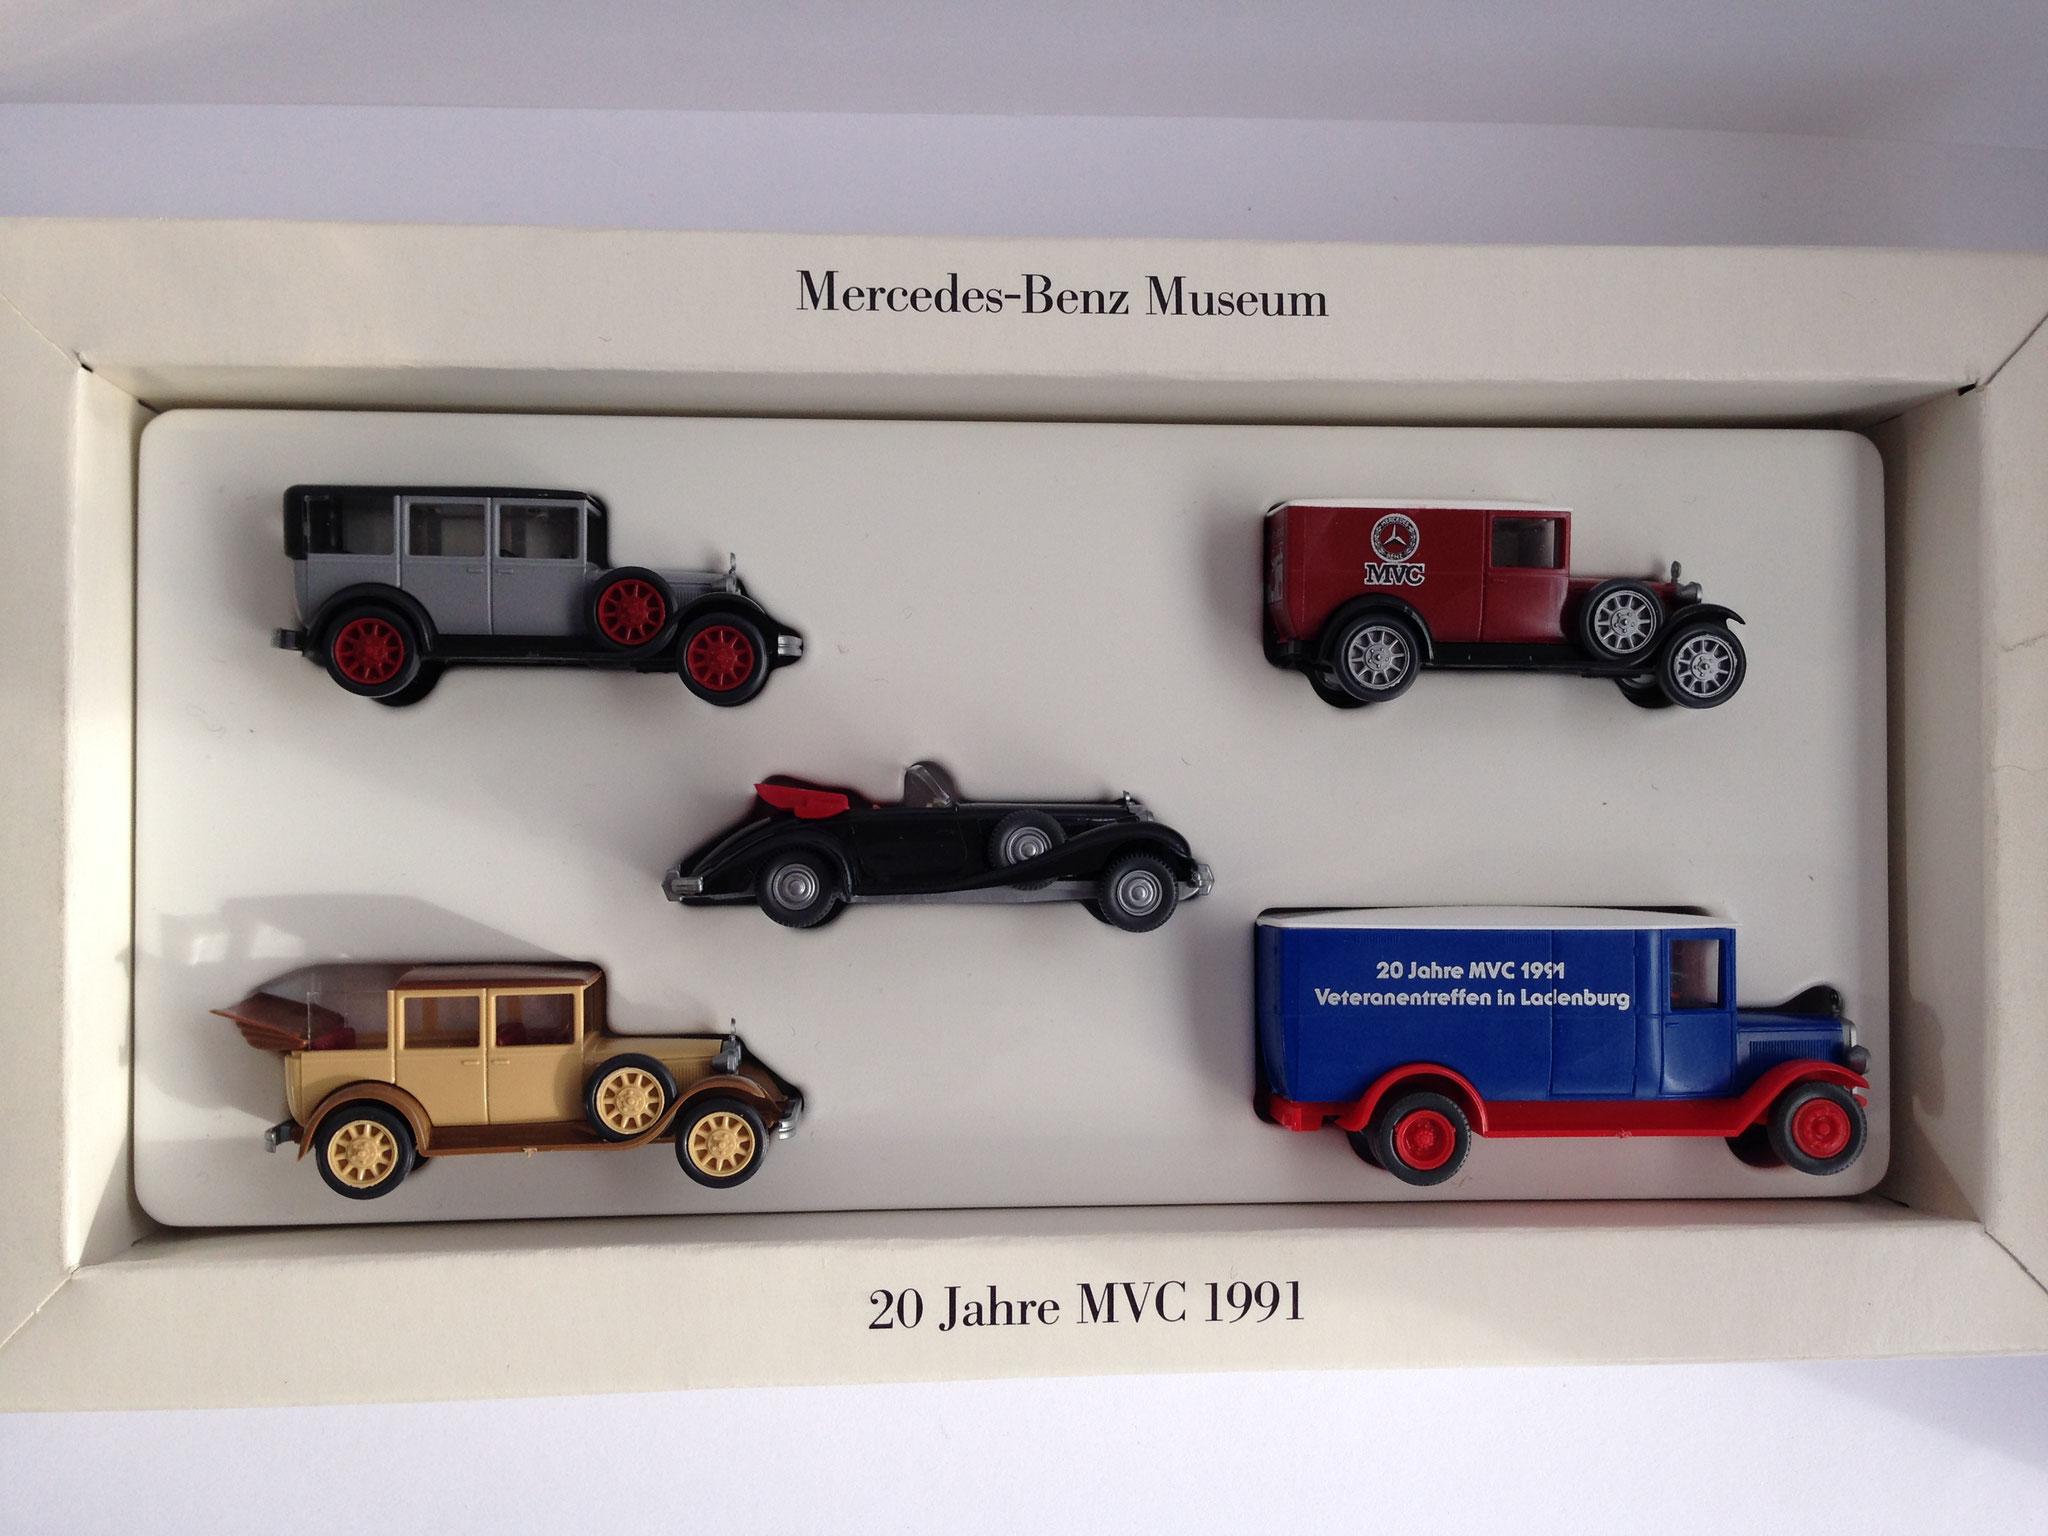 Set 20 Jahre MVC 1991